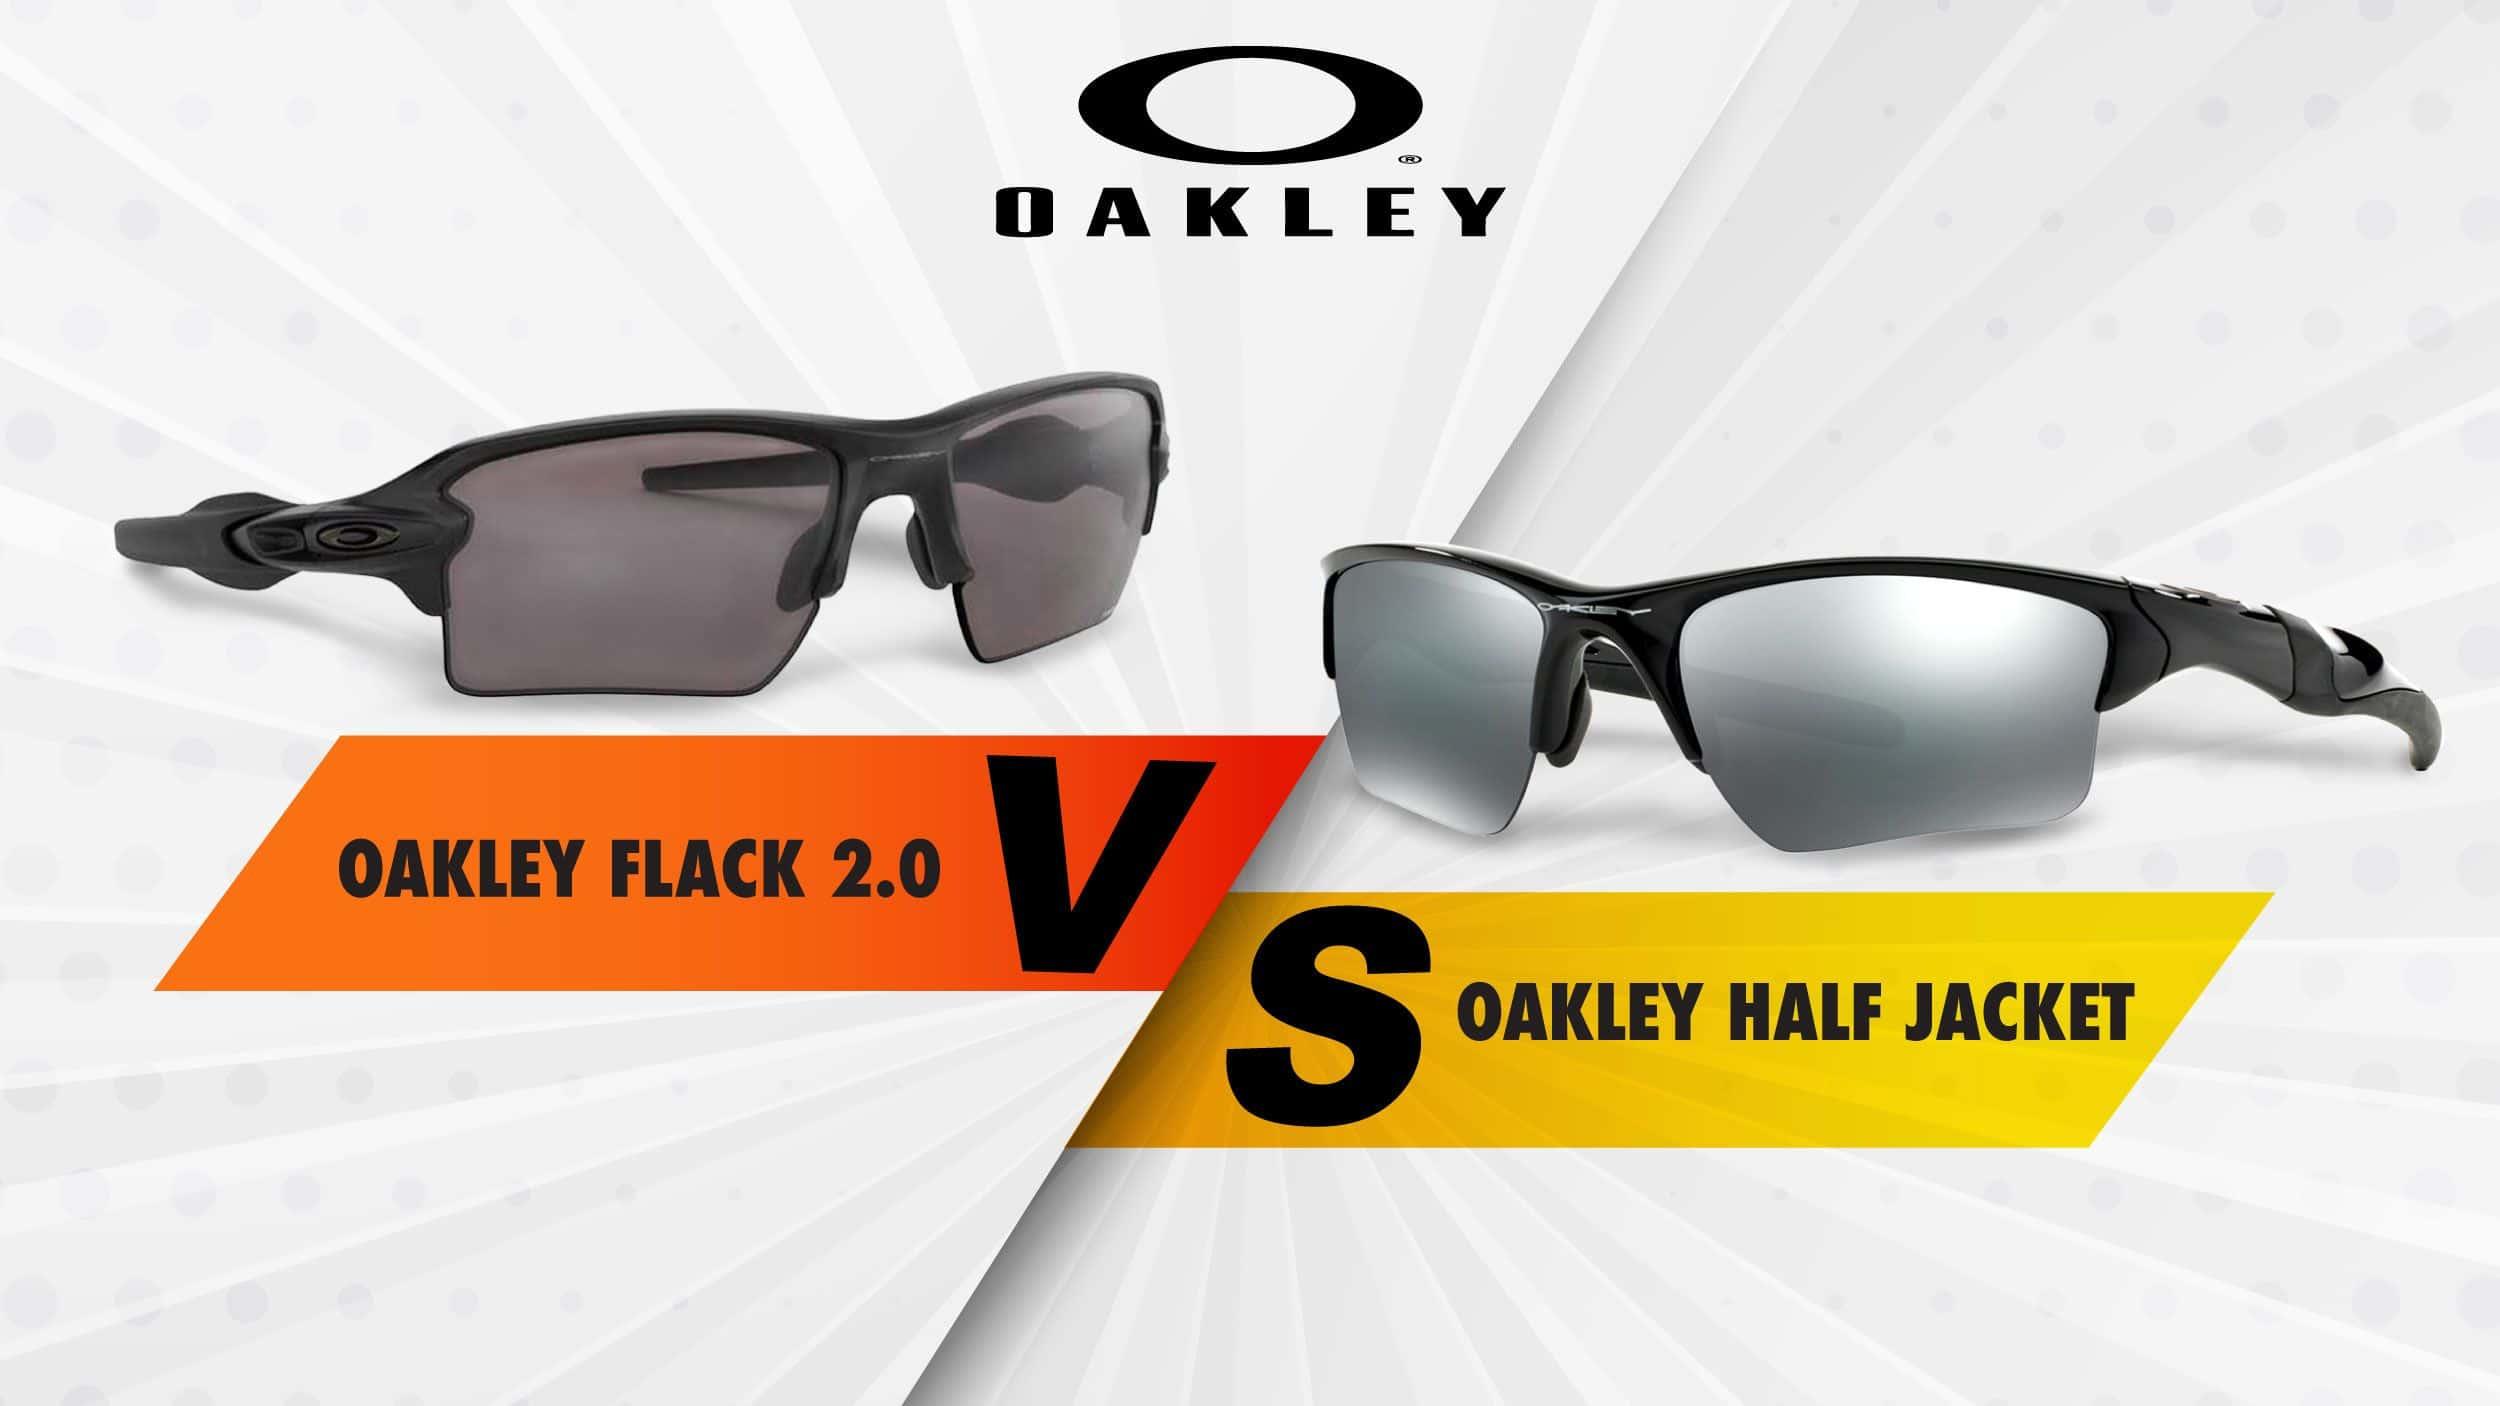 Oakley Flack 2.0 XL vs Oakley Half Jacket Header